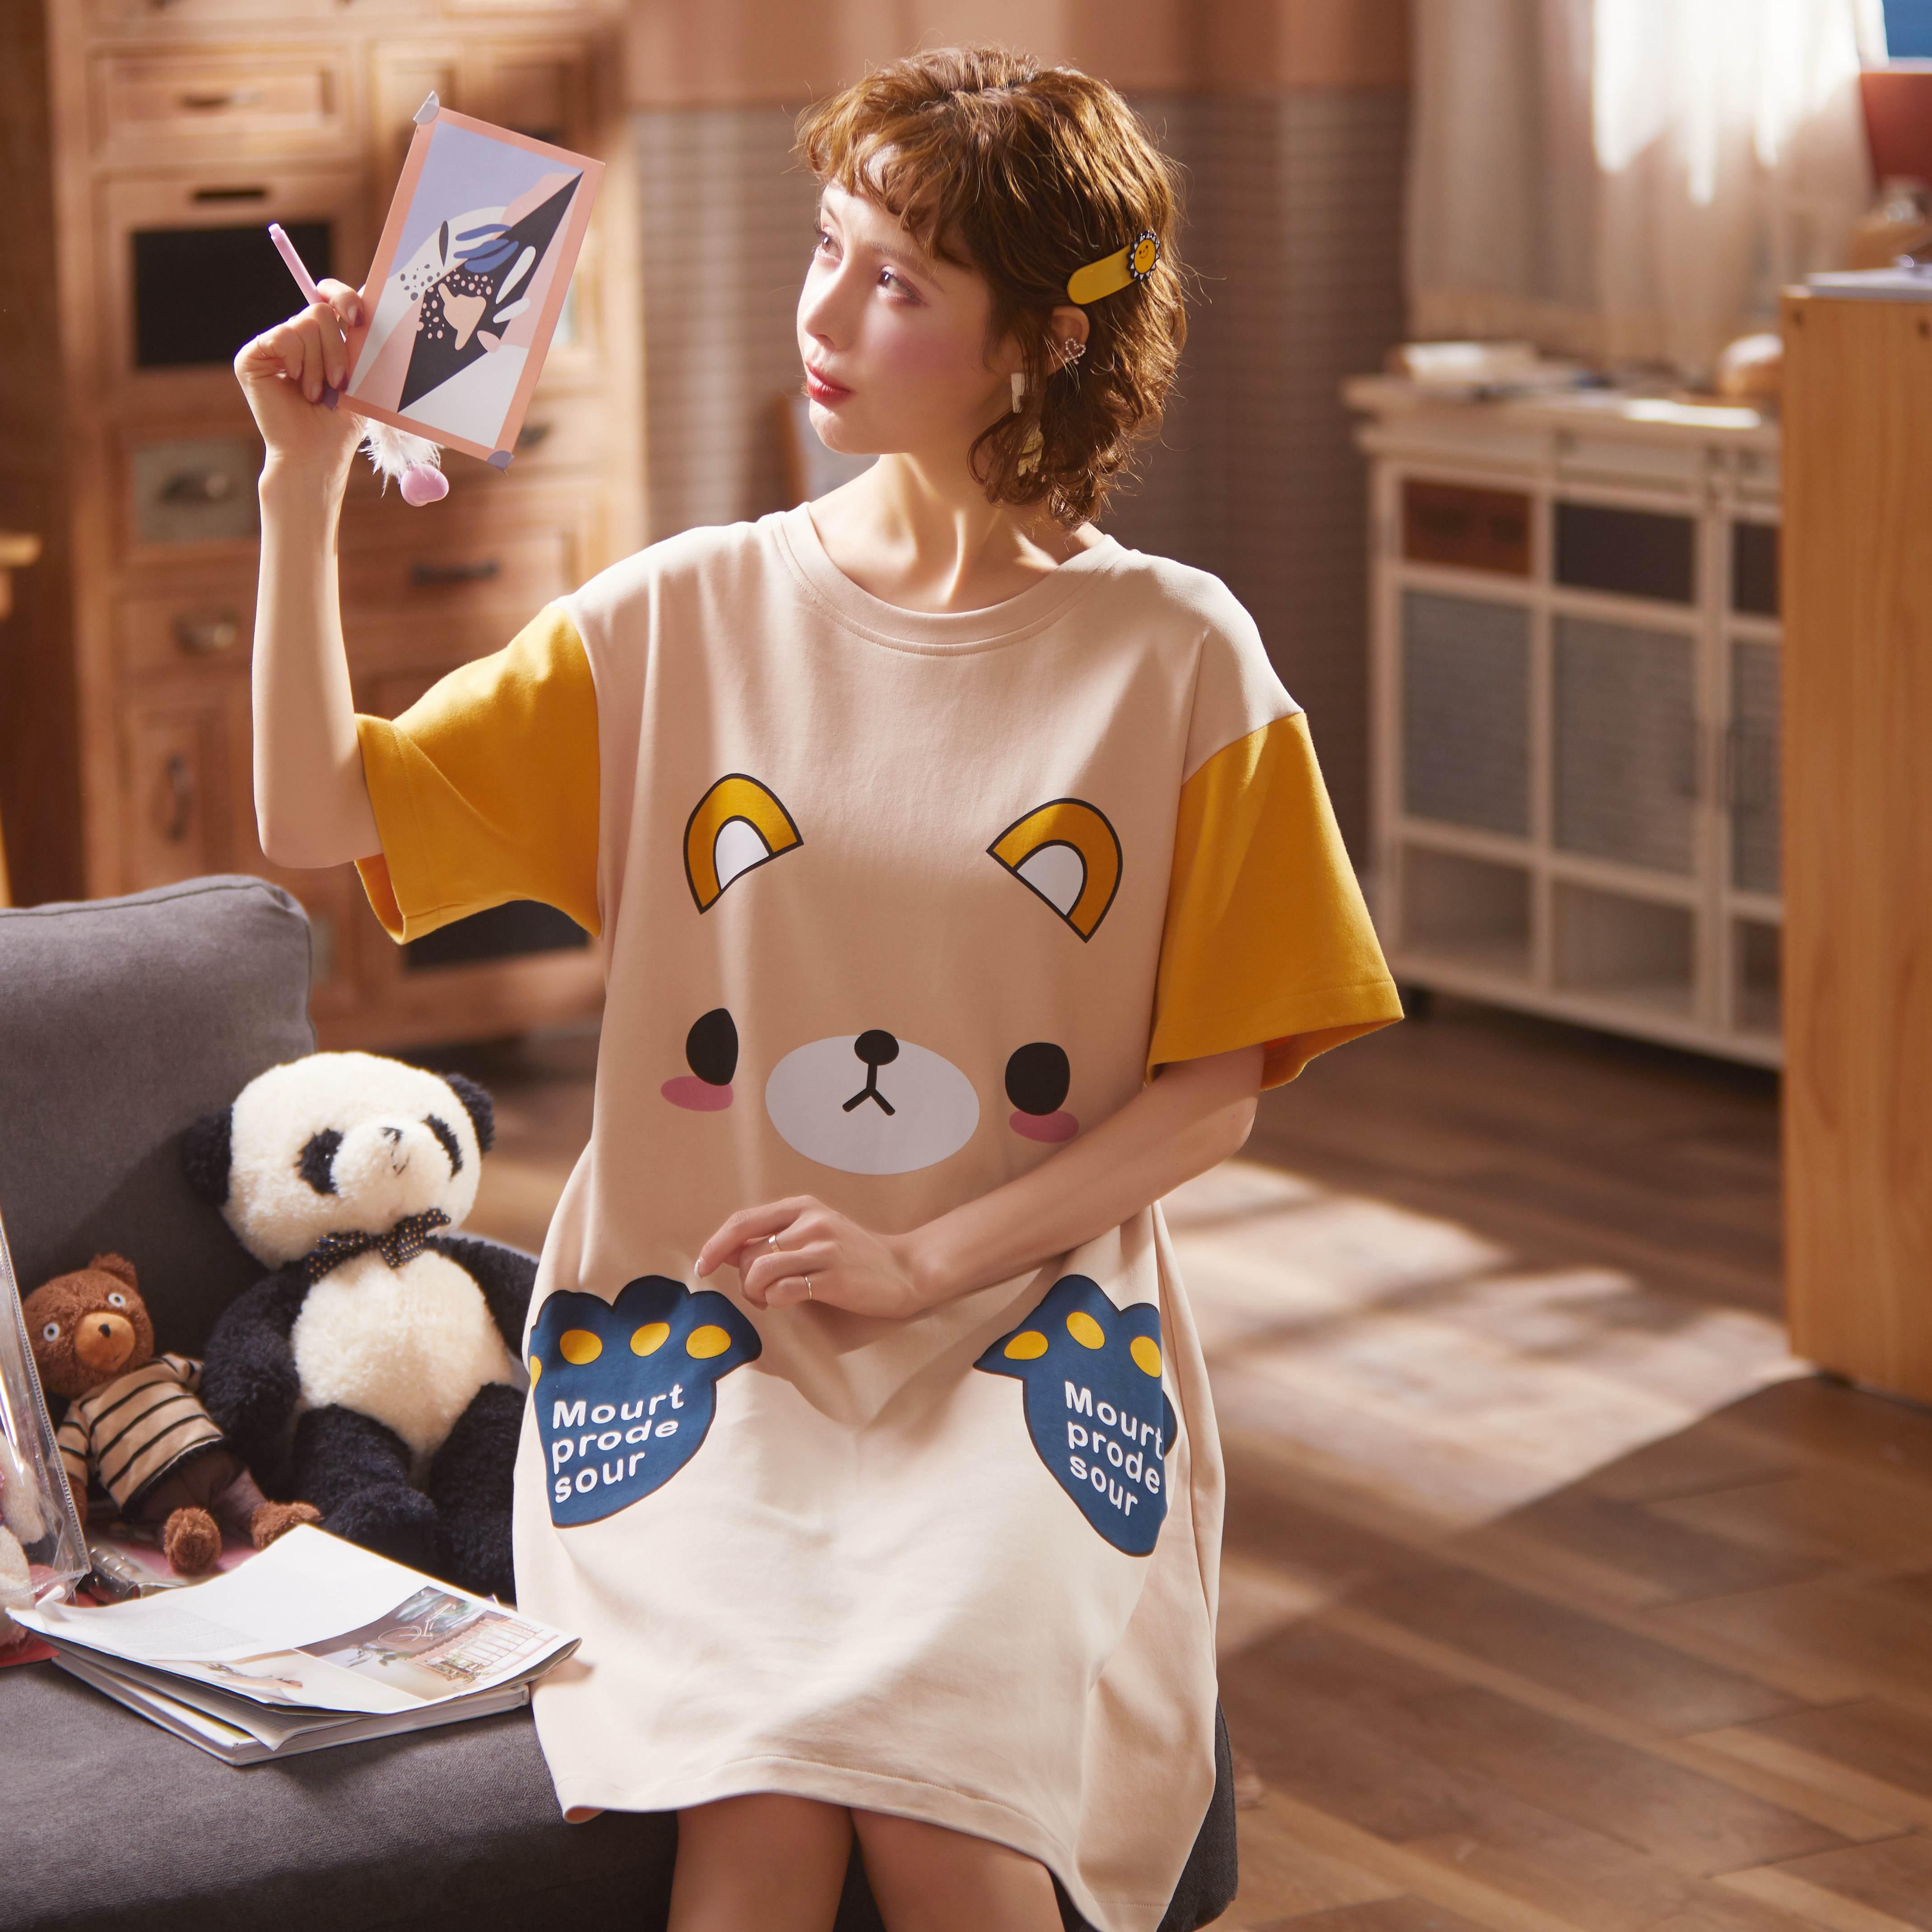 Image 4 - 2020 Summer Night Dress Women Plus Size Nightgown Cartoon Print Sleepshirts Short sleeves Nightie Nightdress Cotton SleepwearNightgowns & Sleepshirts   -